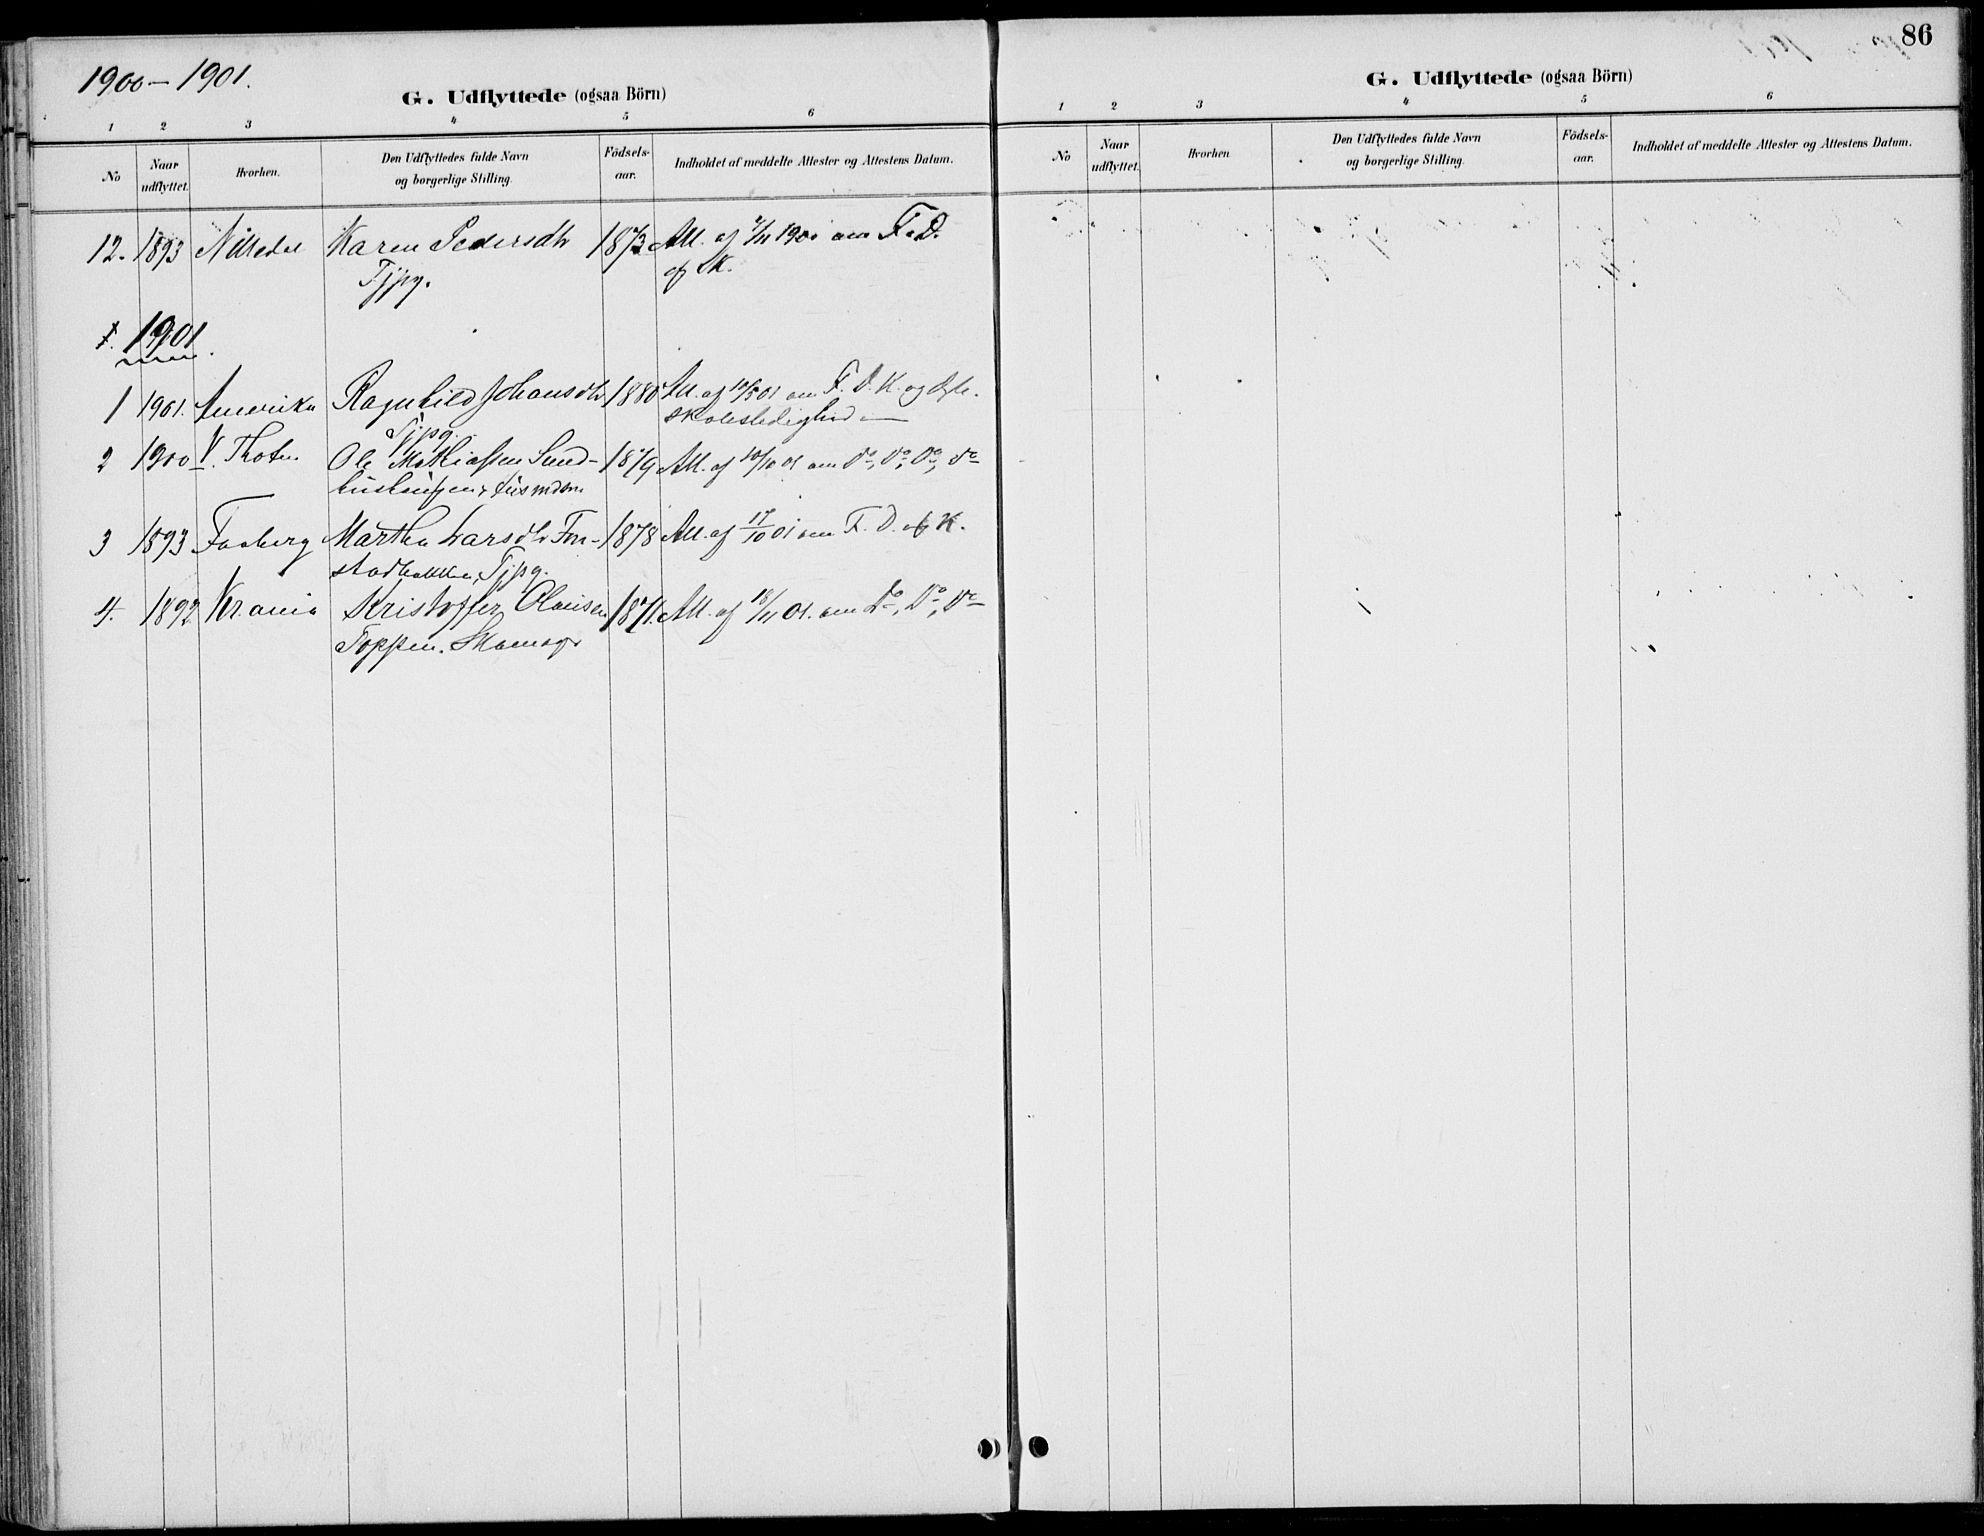 SAH, Østre Gausdal prestekontor, Ministerialbok nr. 3, 1887-1901, s. 86